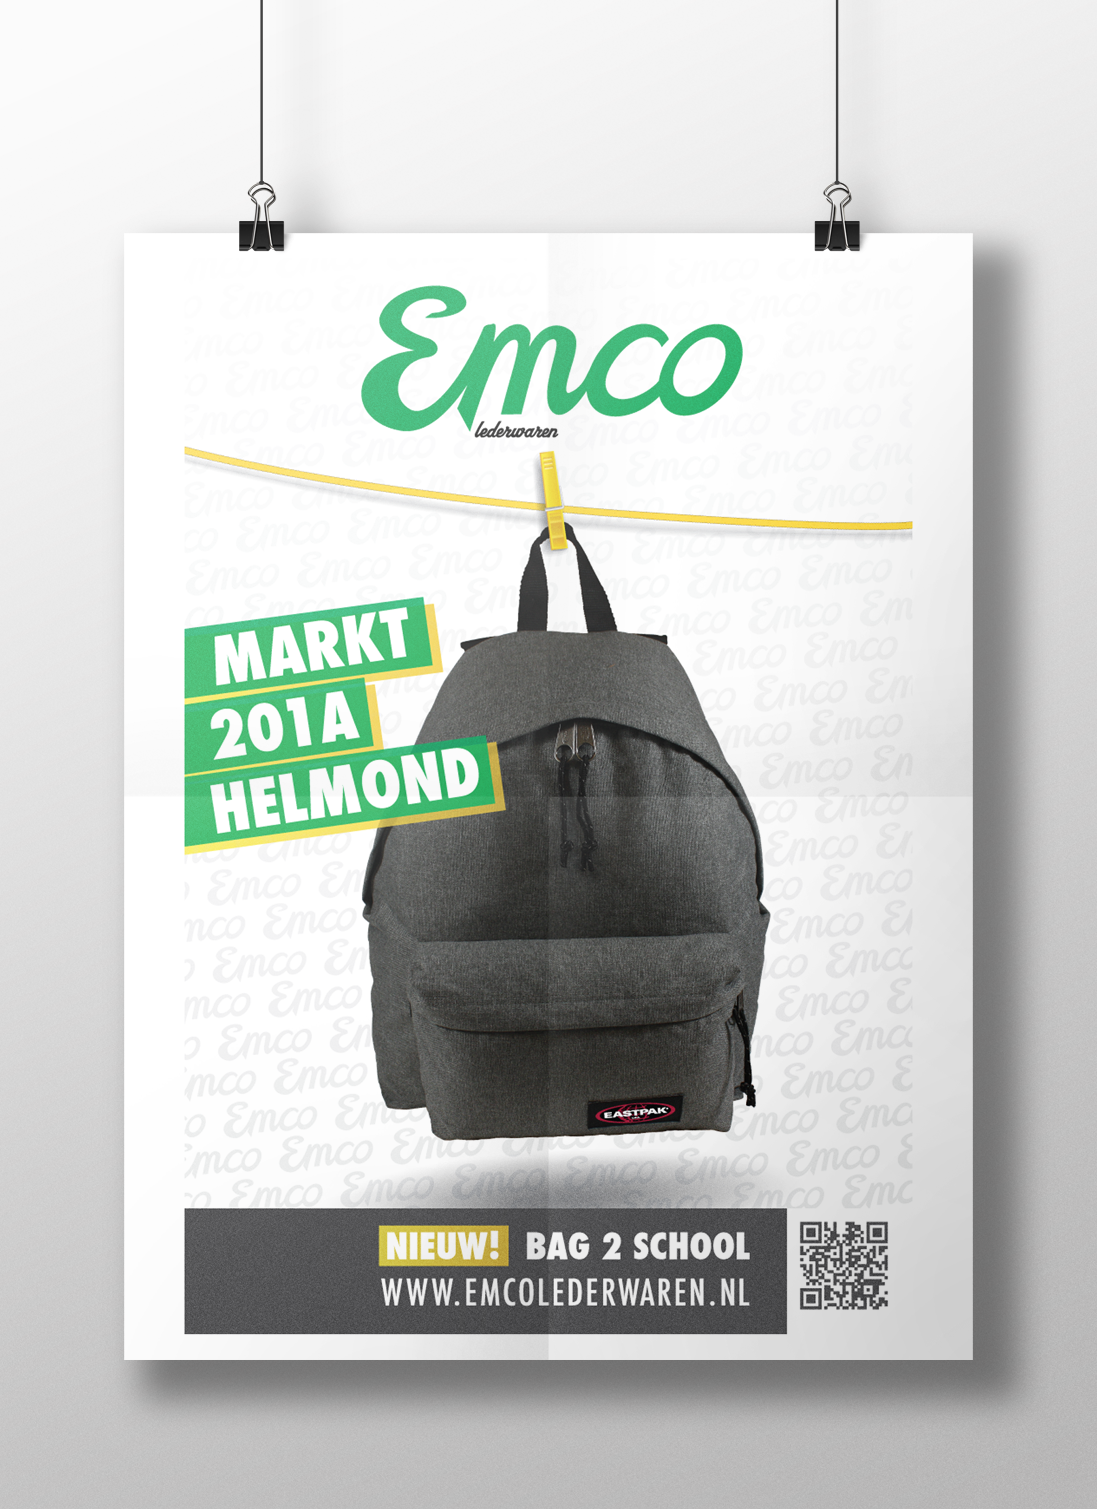 Emco_Lederwaren_Abri_poster_Xander_Abbink-2